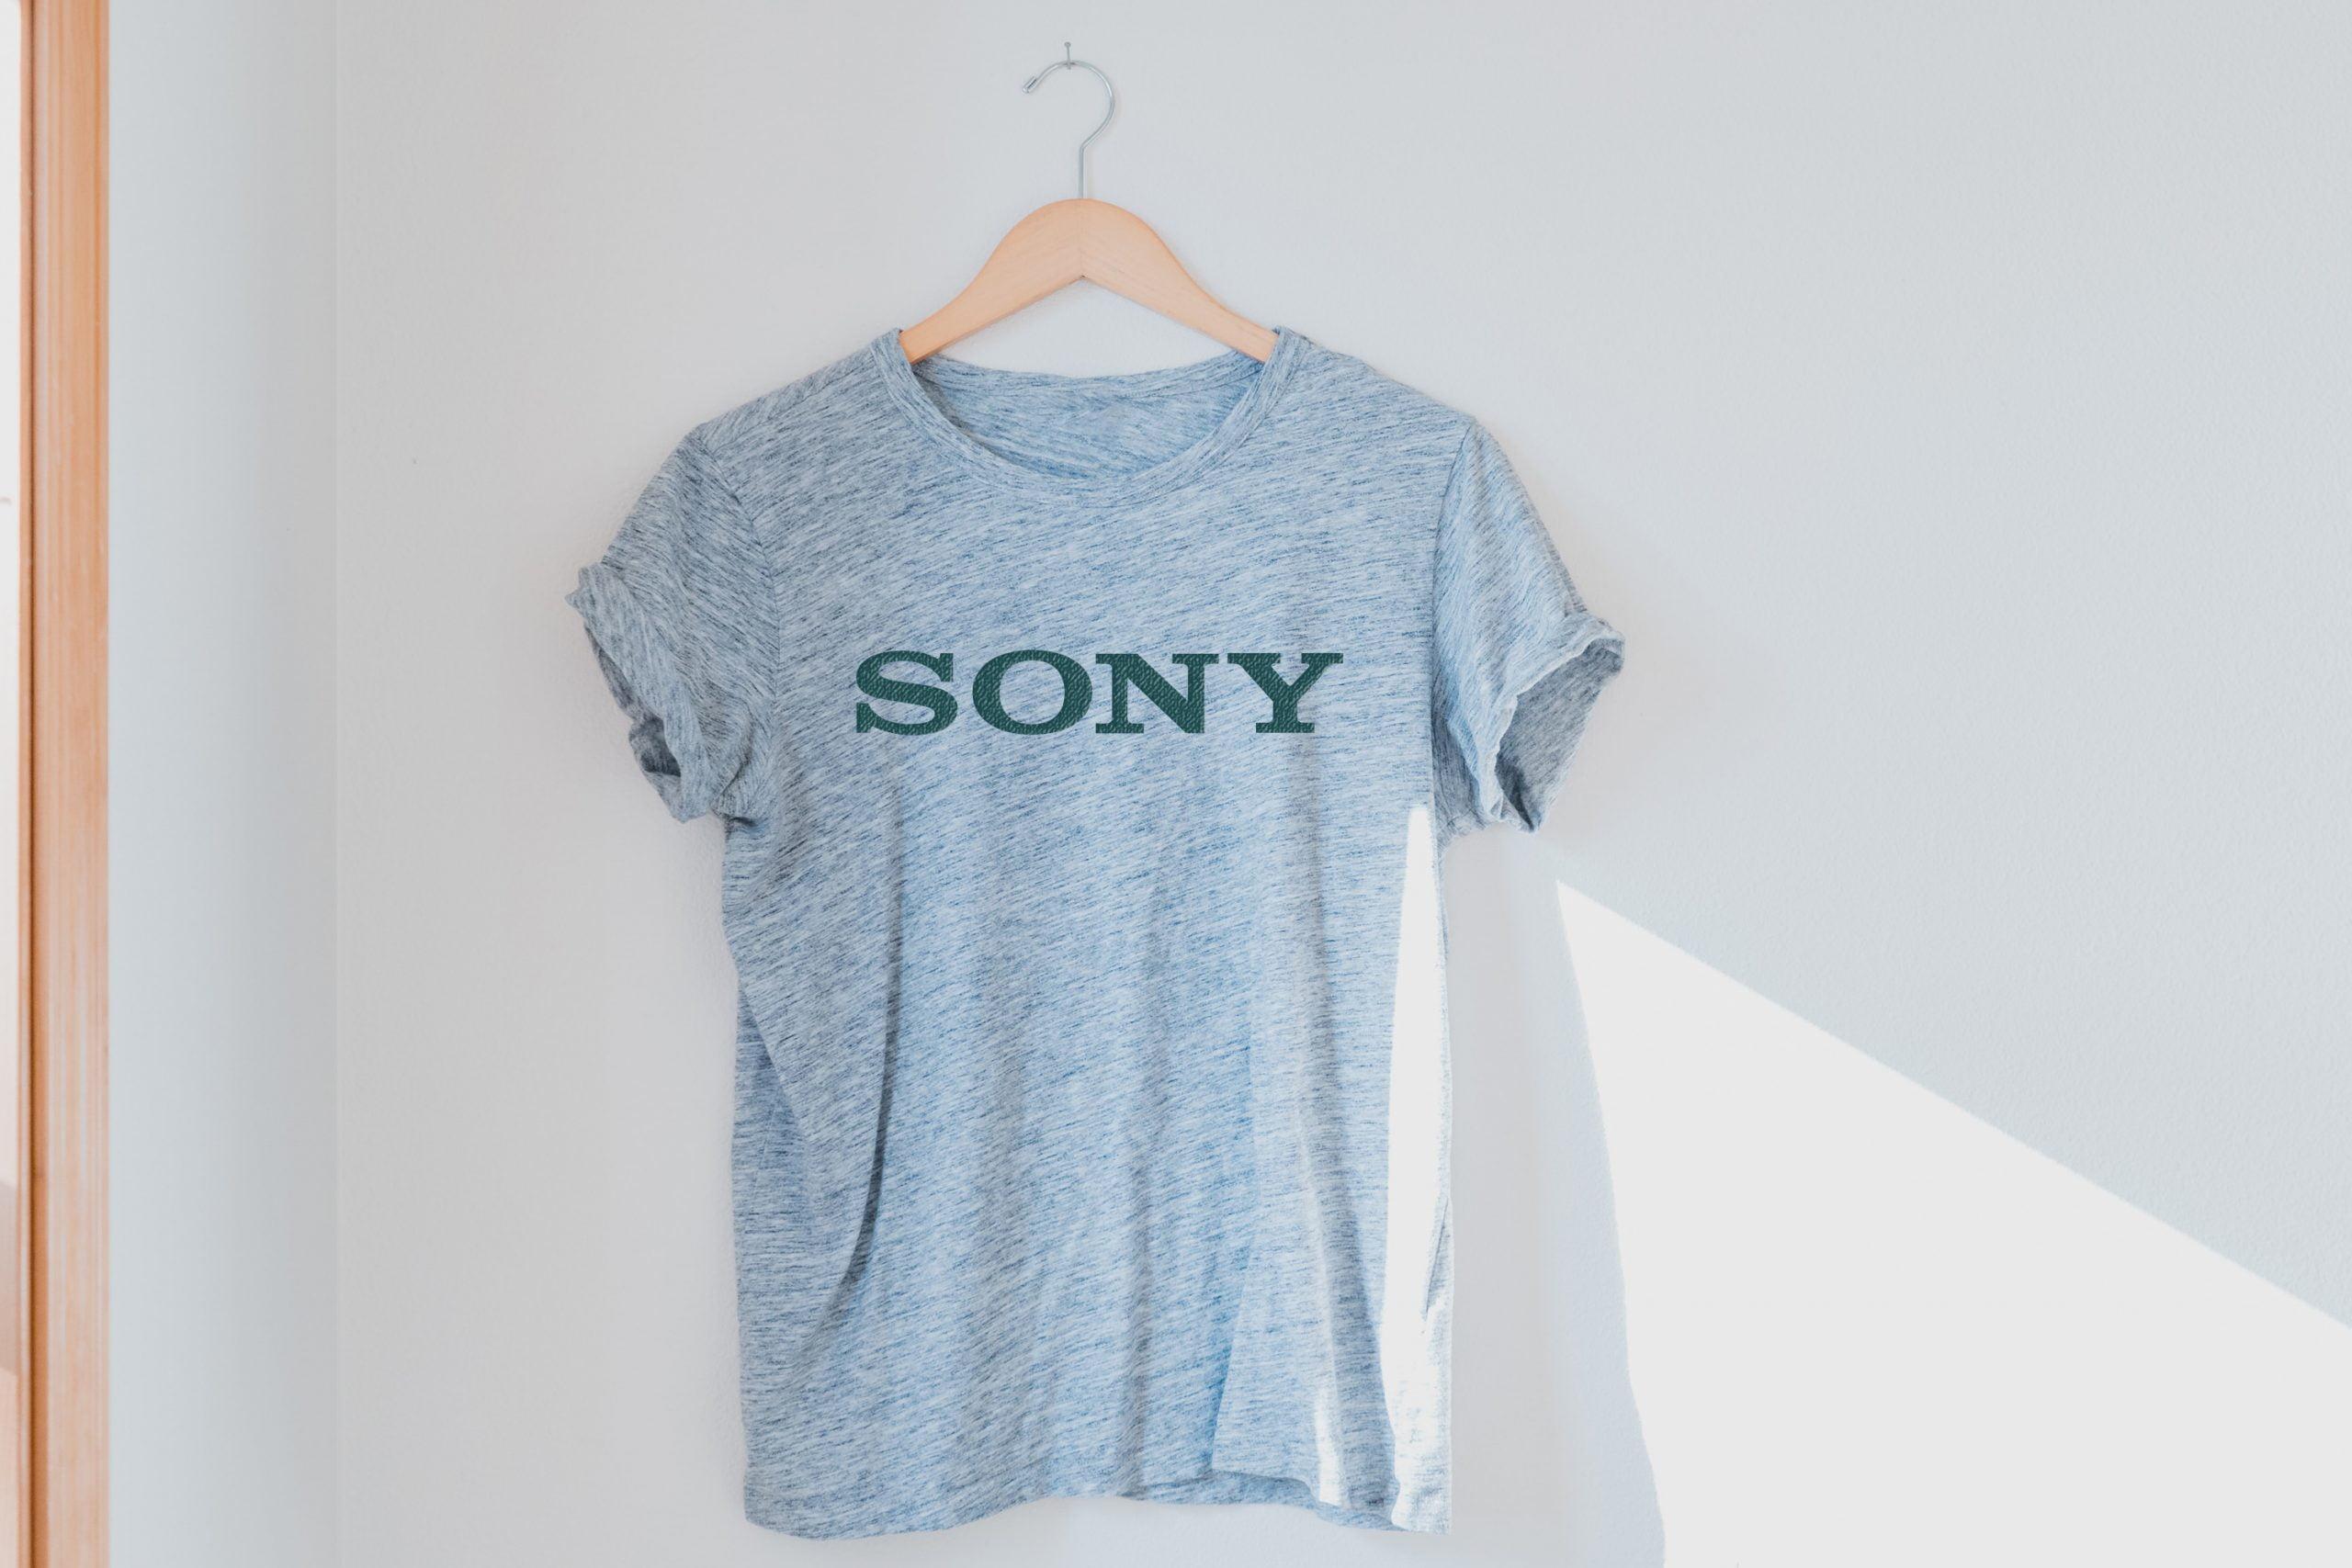 Download Haze Gray T-Shirt Logo Mockup